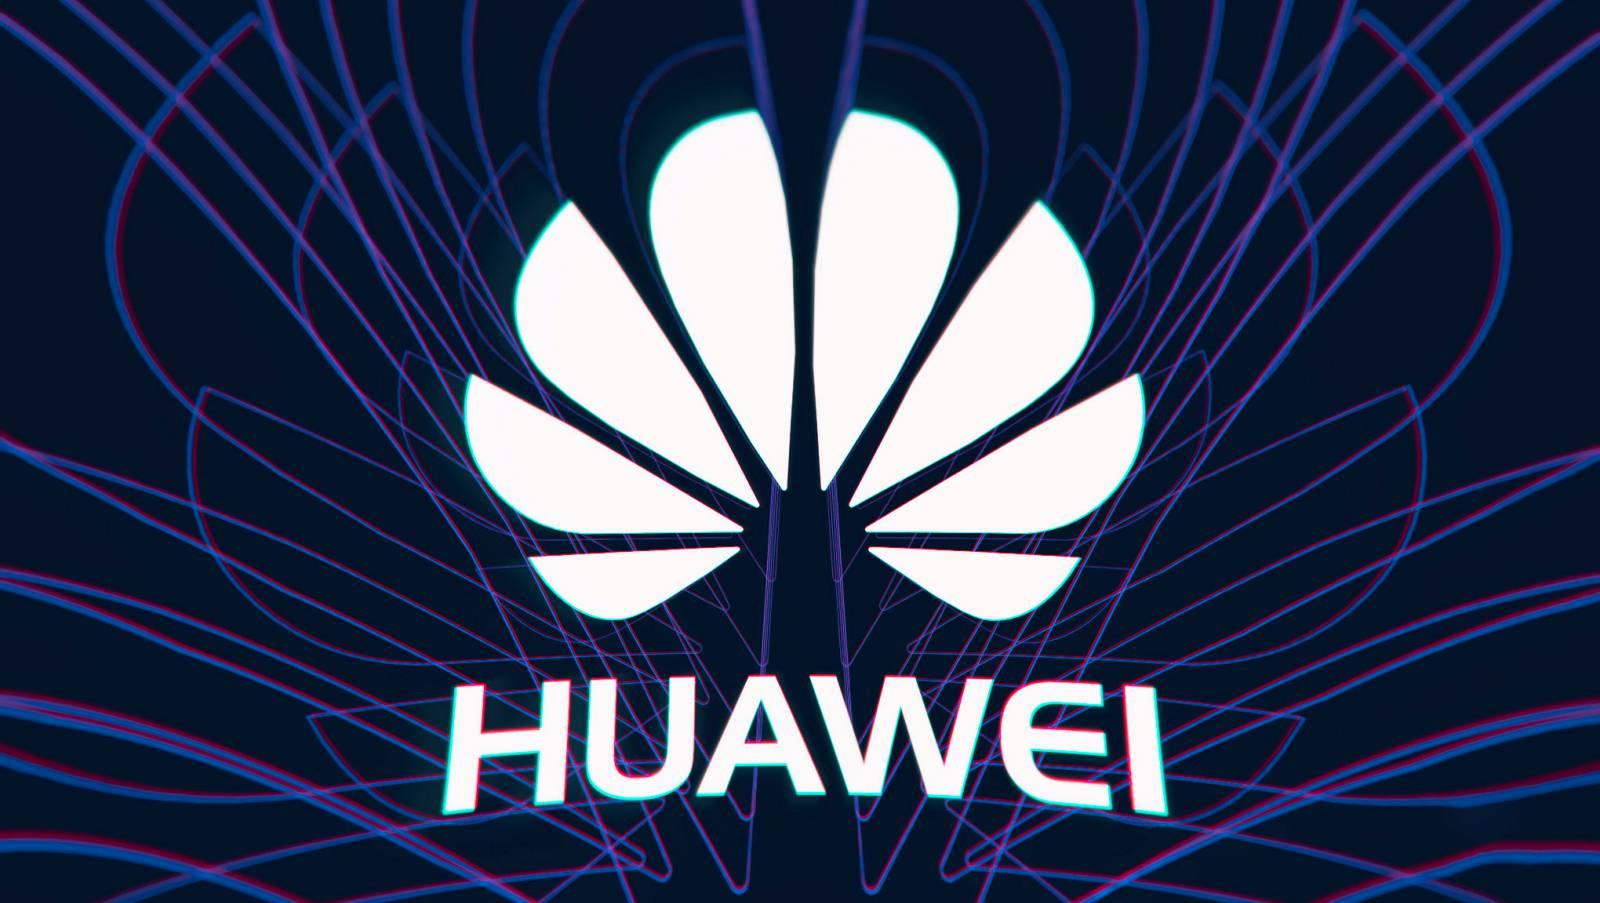 Huawei smartphone apple samsung